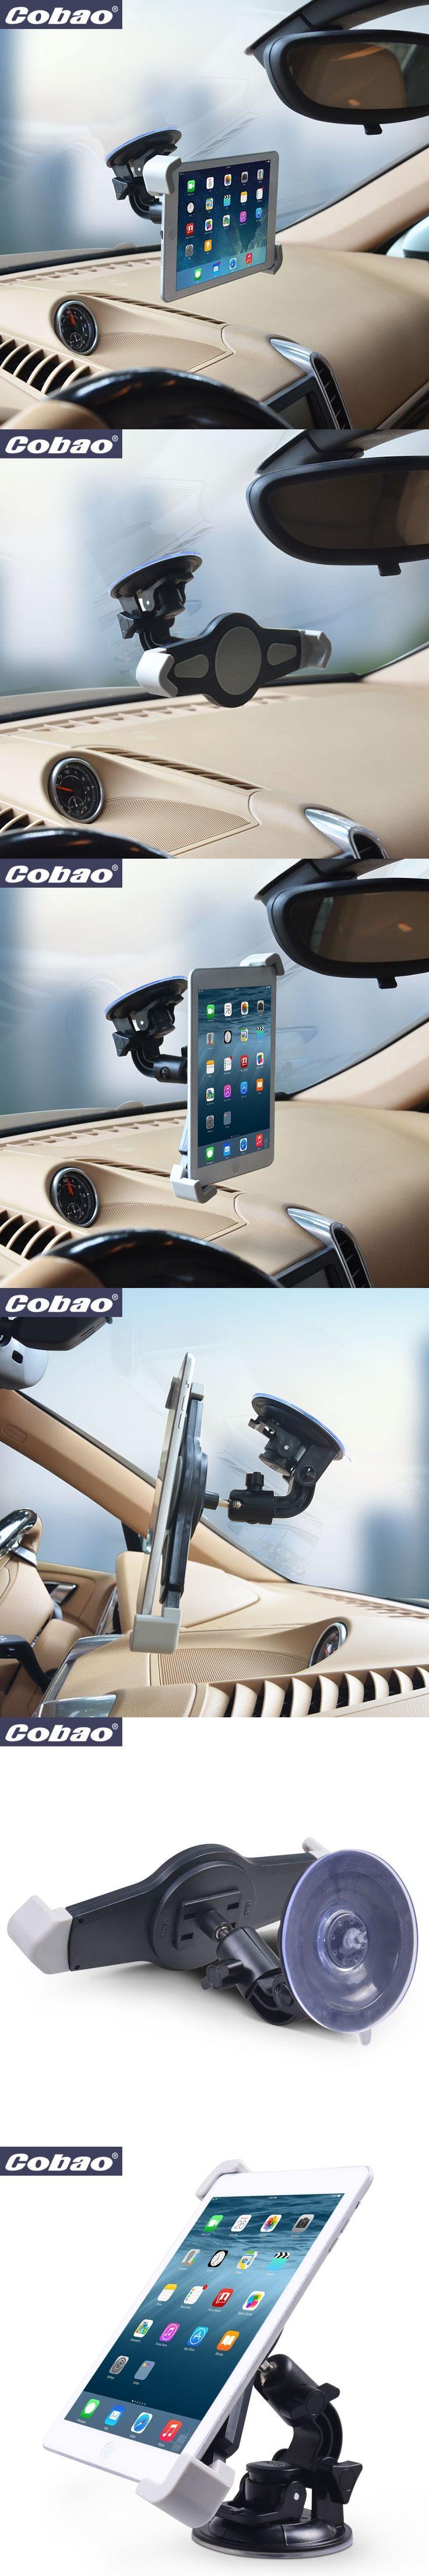 New 7 8 9 10 inch Tablet Car Holder Universal soporte tablet desktop Windshield Car mount cradle For iPad Samsung Tab Stand